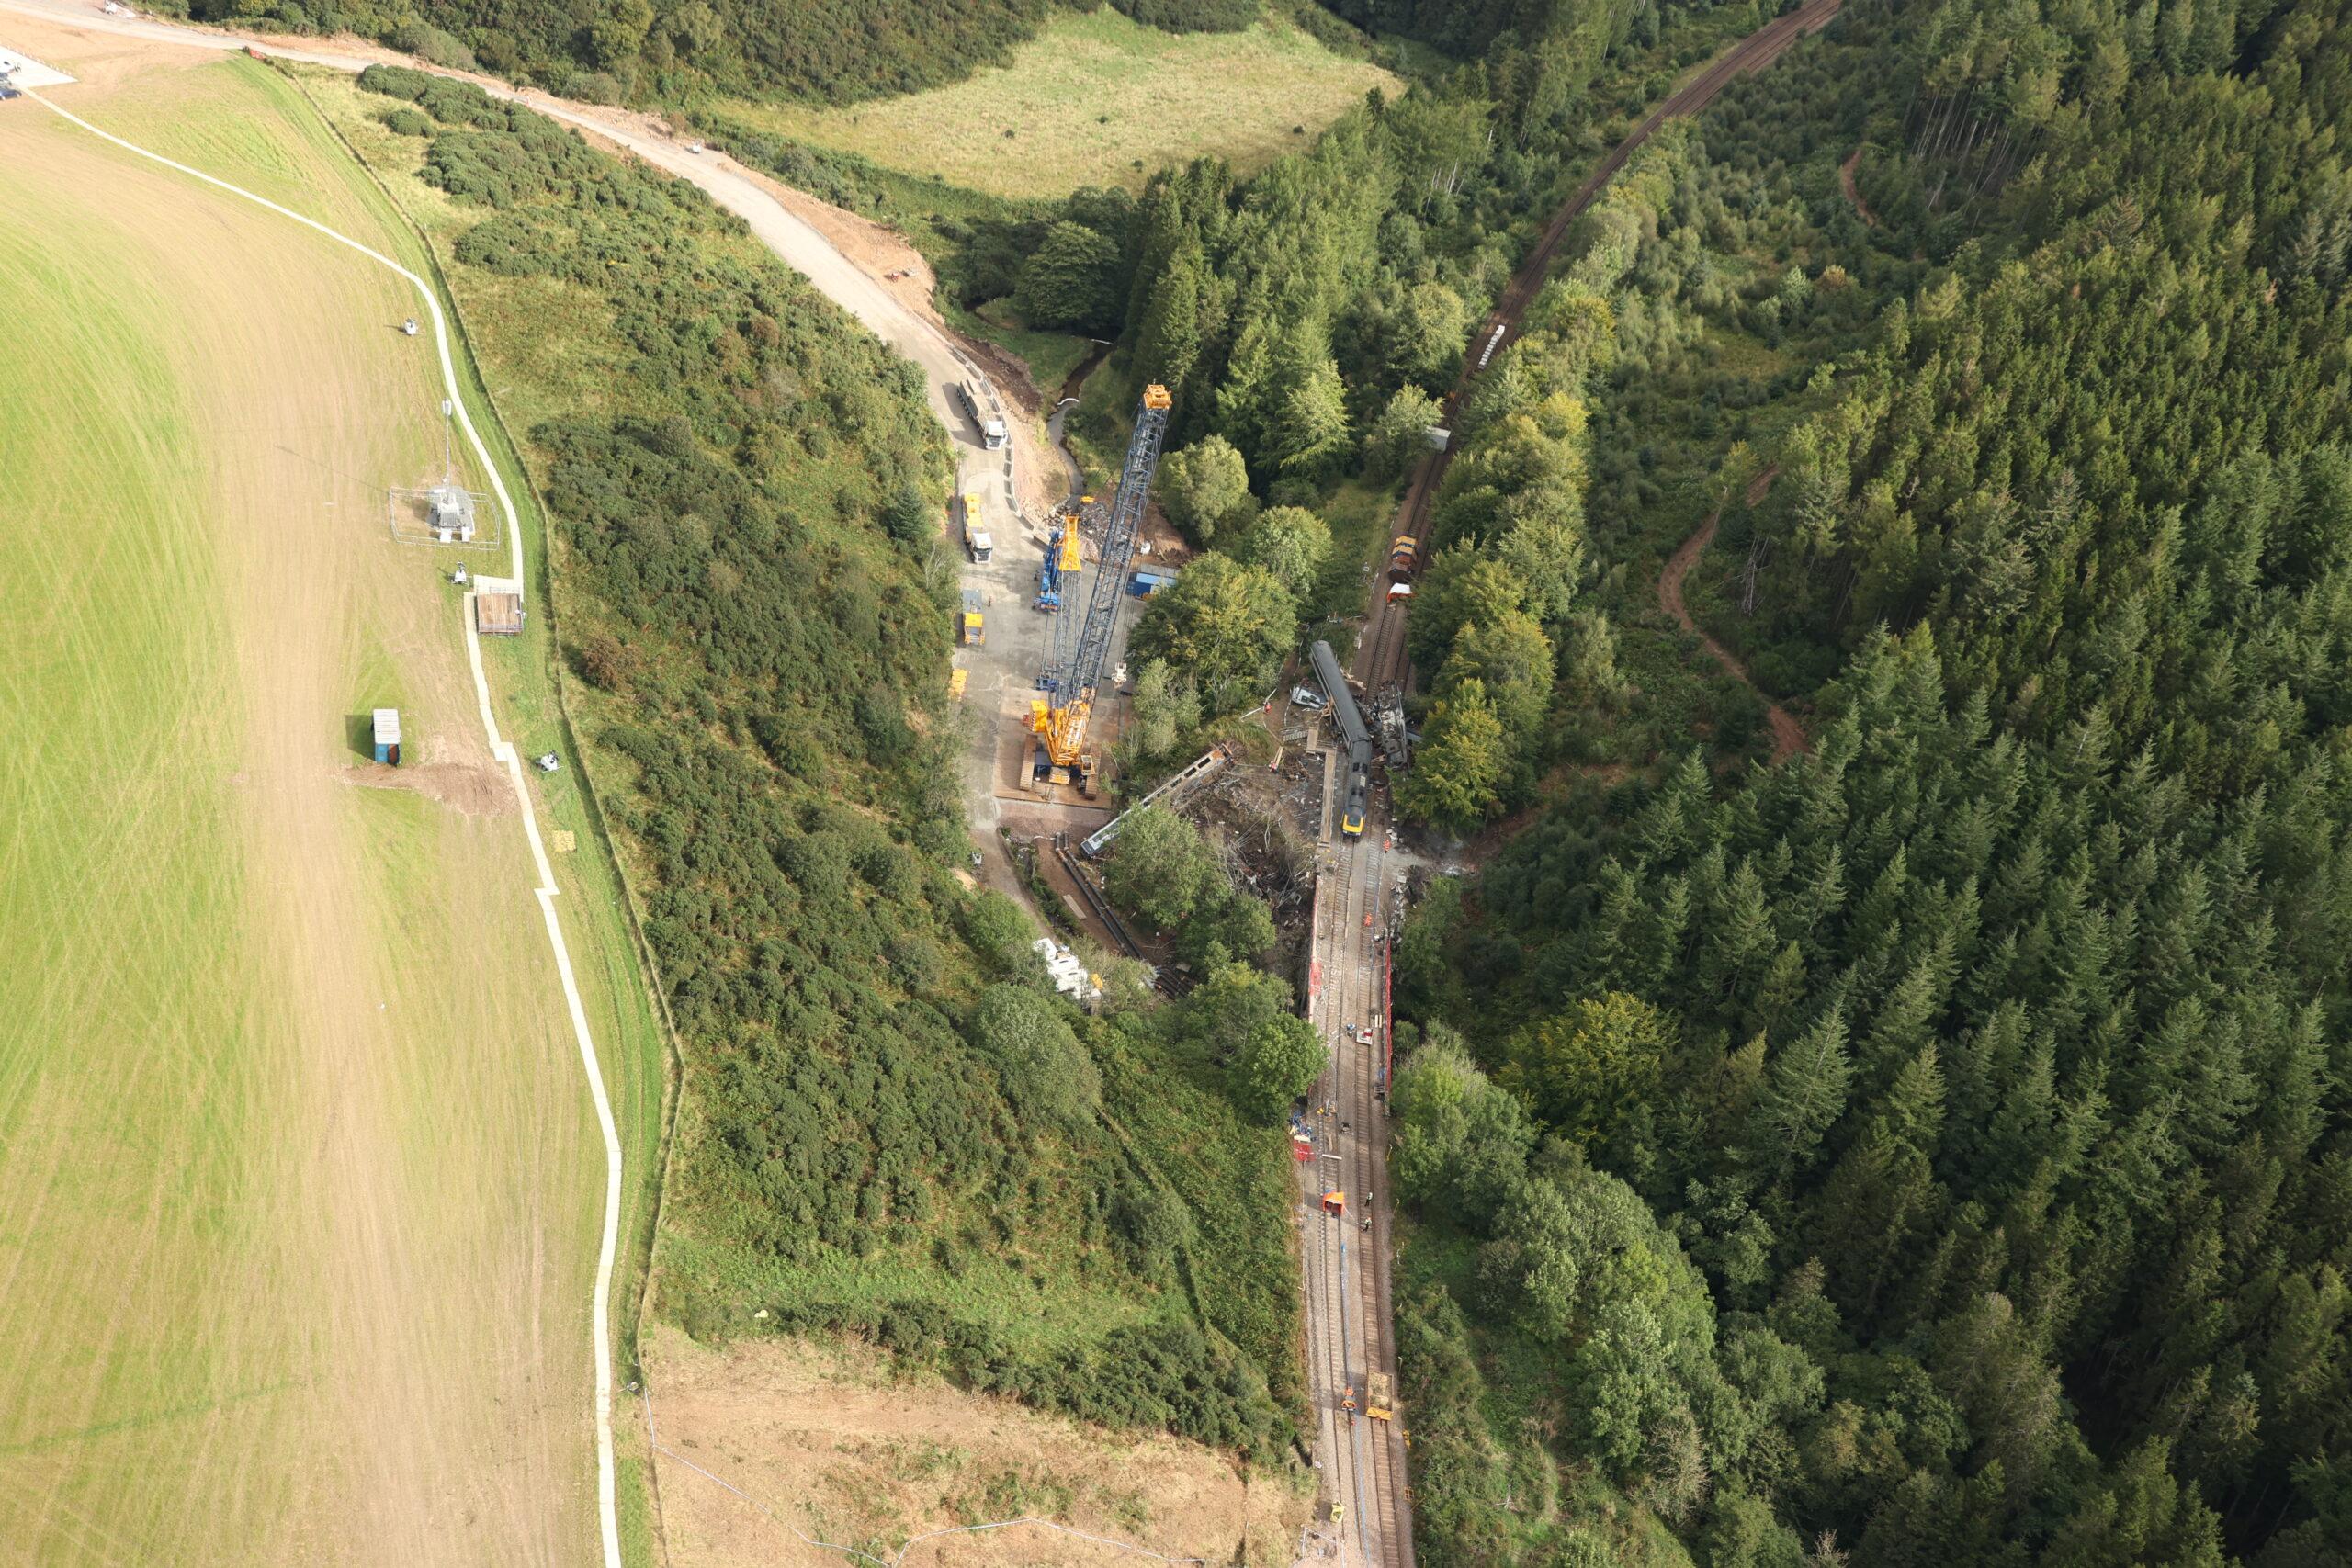 Stonehaven derailment site, 8 September